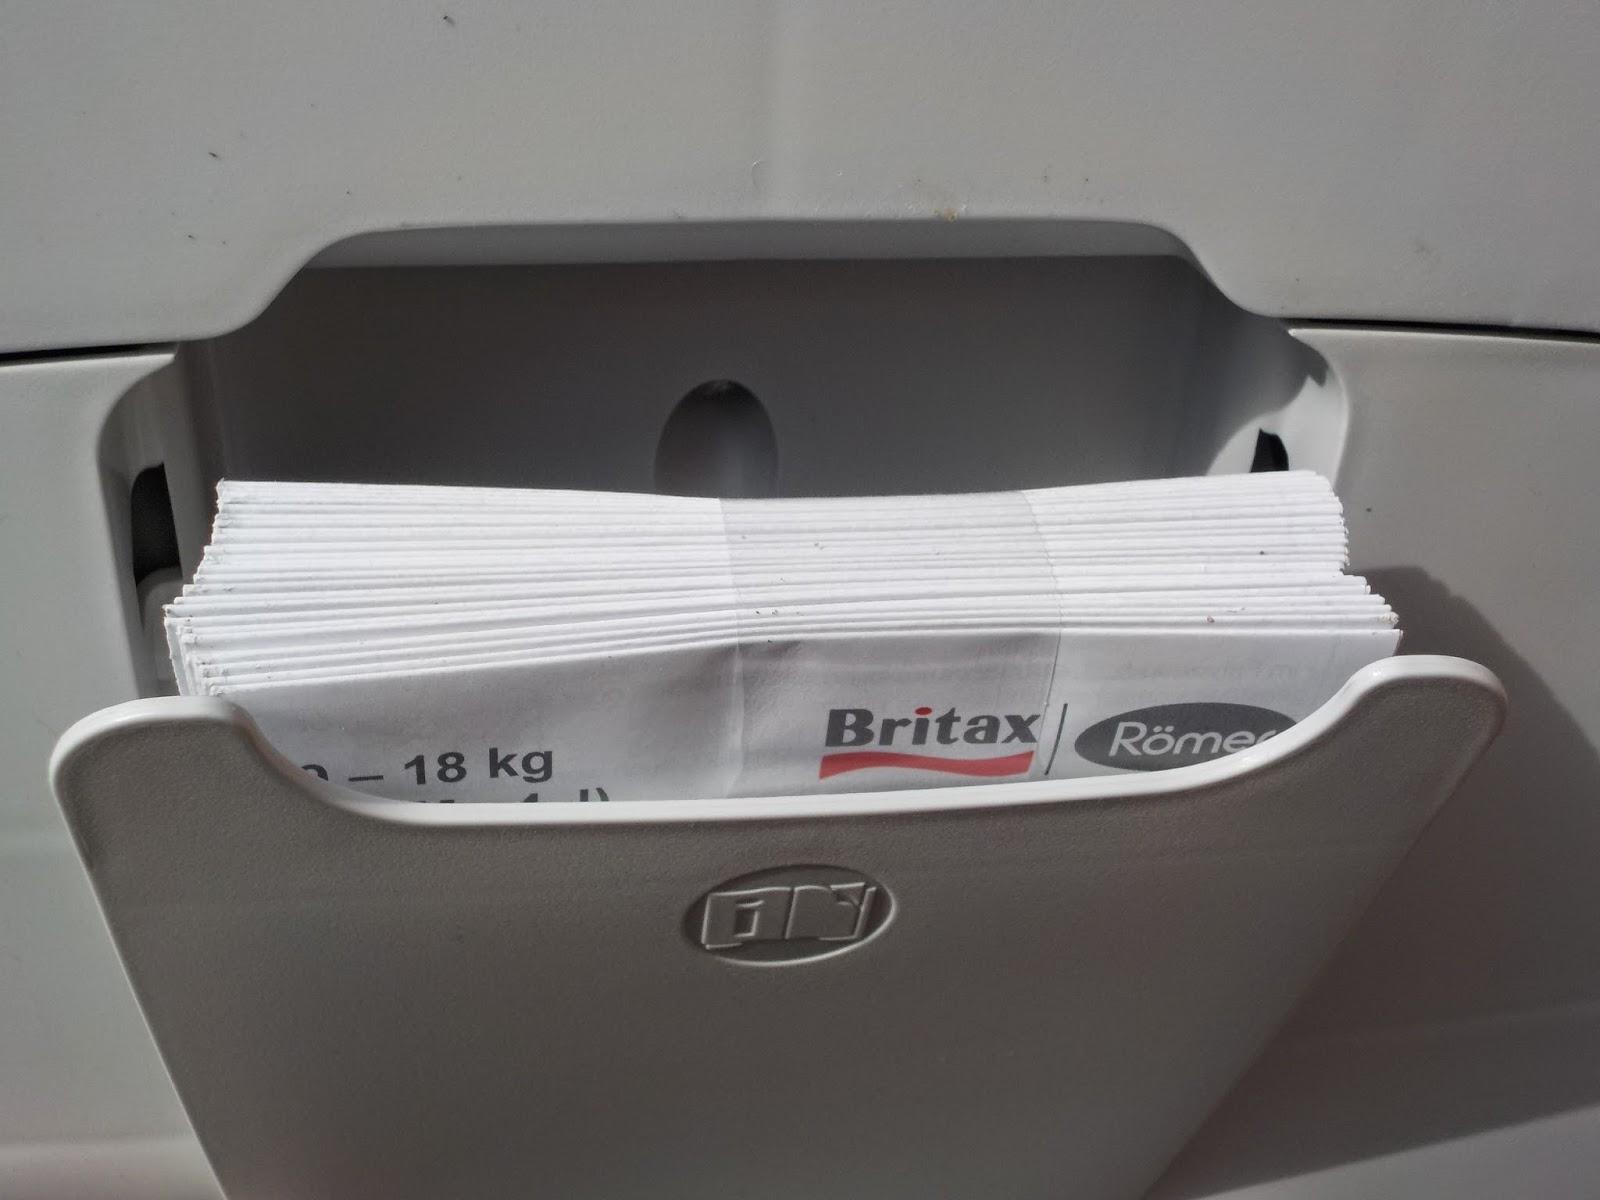 Britax store instruction manual